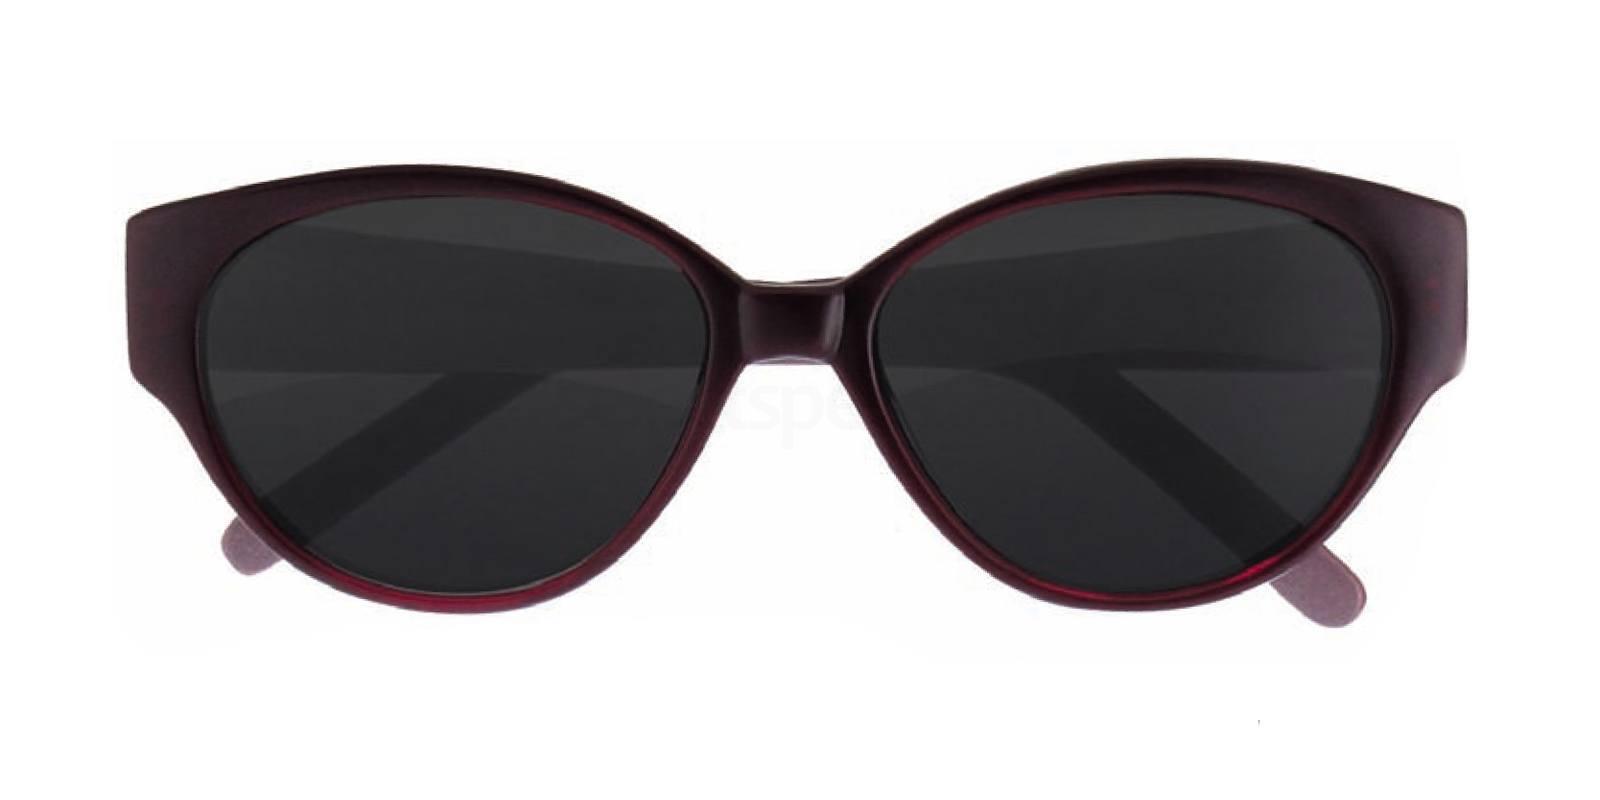 C01 OWIS128 Sunglasses, Owlet